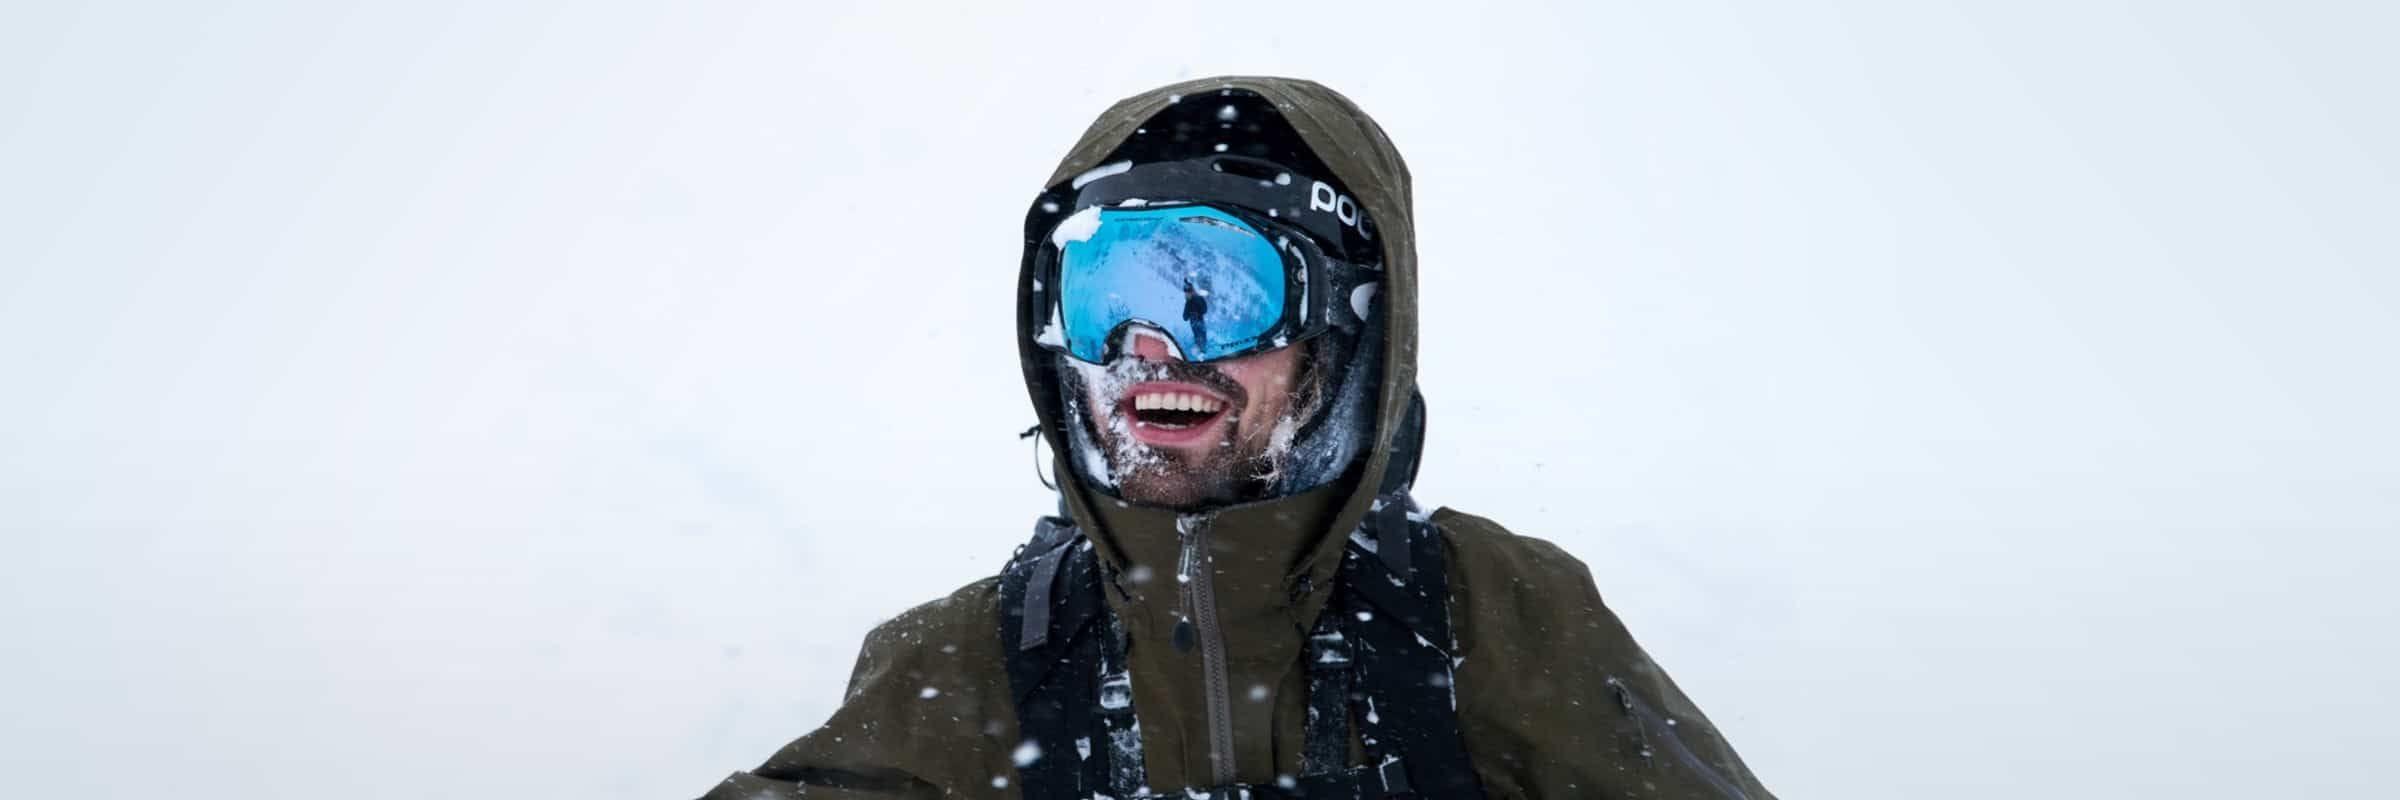 Arc'teryx, Ski & Snowboard. Arc'teryx Men's Theta AR Jacket Reviewed